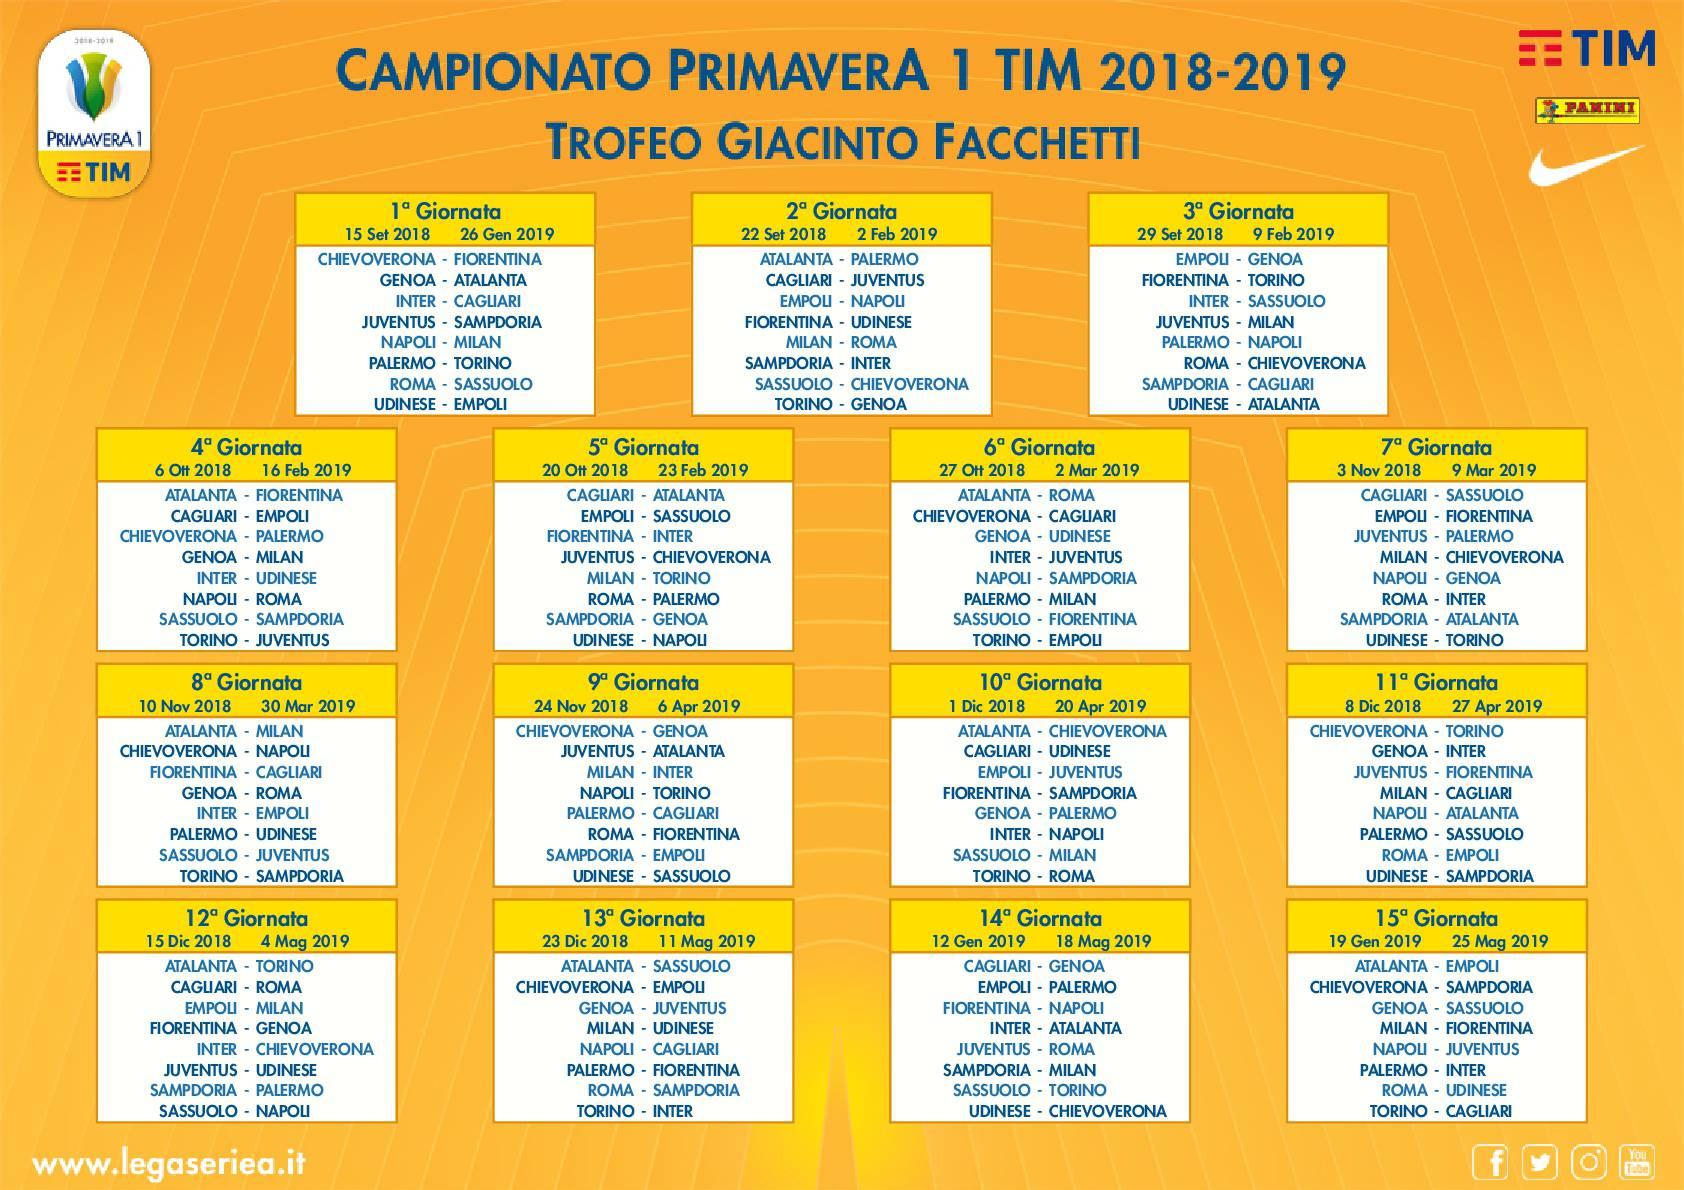 Calendario Serie A Milan Inter.Campionato Primavera Calendario Ufficiale Napoli Milan Alla 1ª